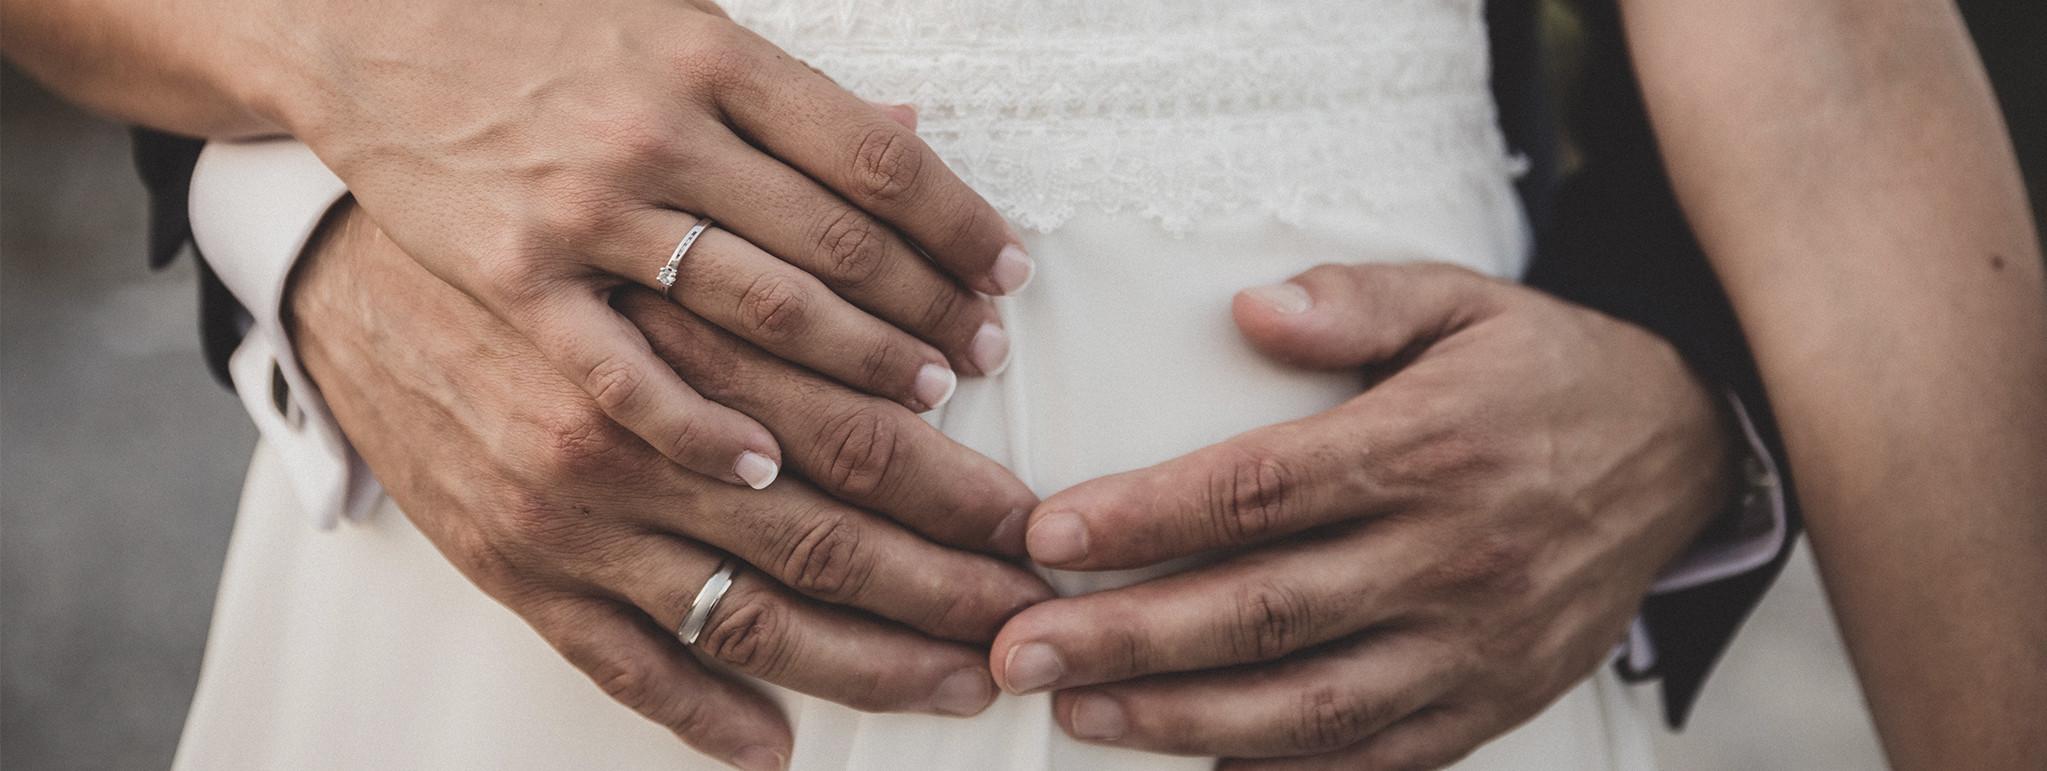 Fotografo bodas badajoz merida sevilla caceres Estrella Diaz Photovisual 33